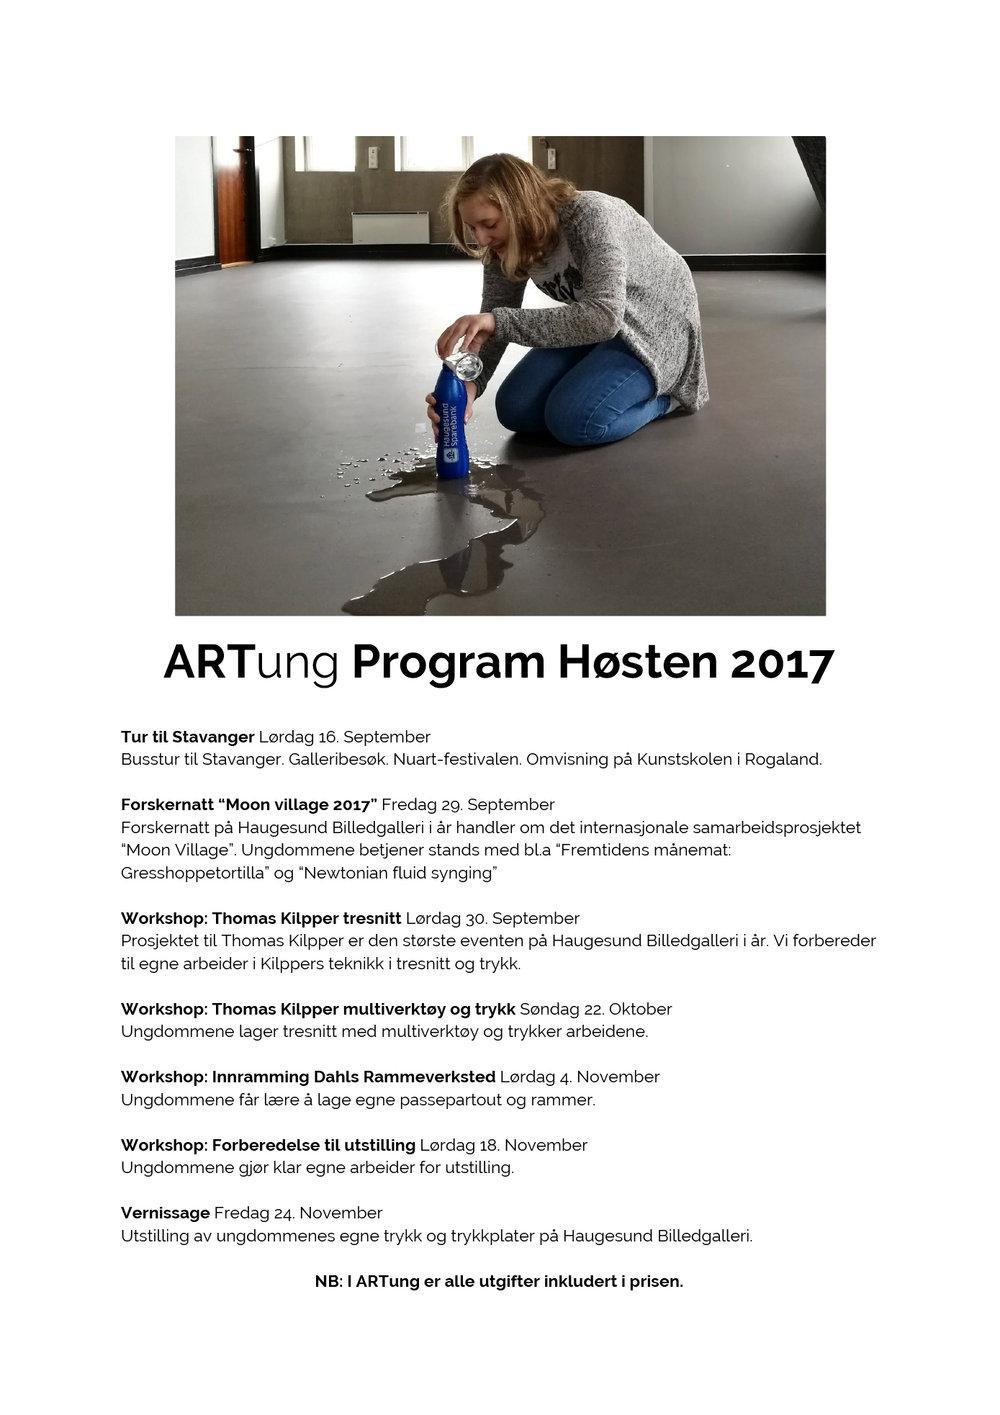 ARTung Program Høsten 2017.jpg